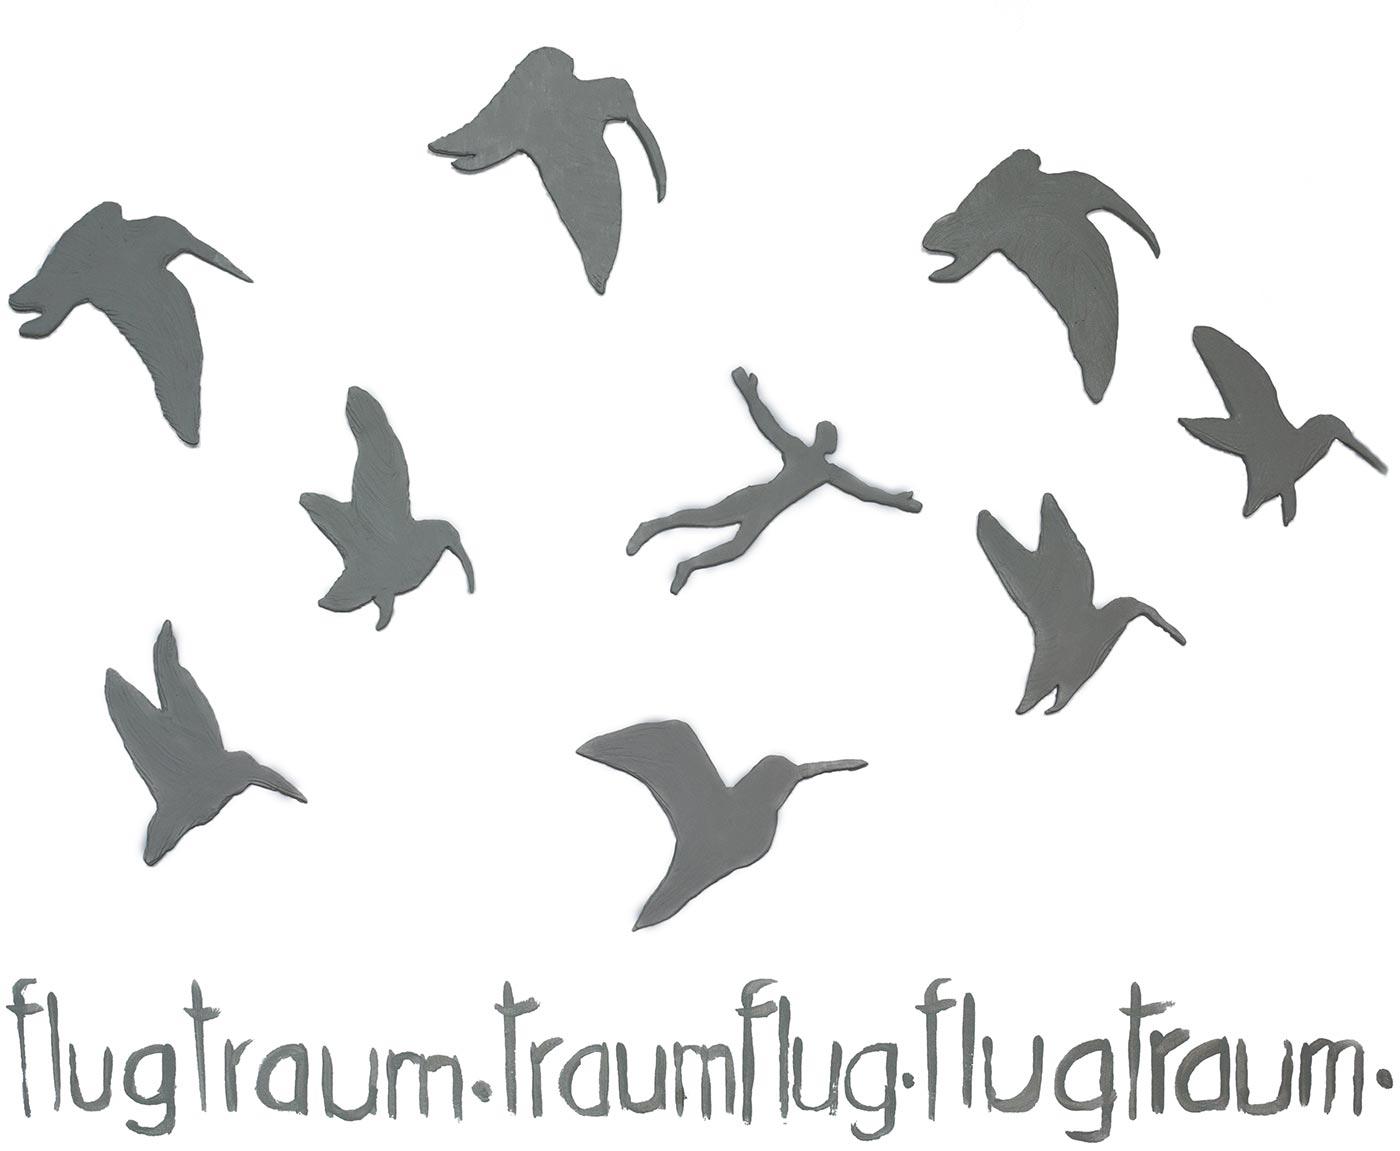 flugtraum